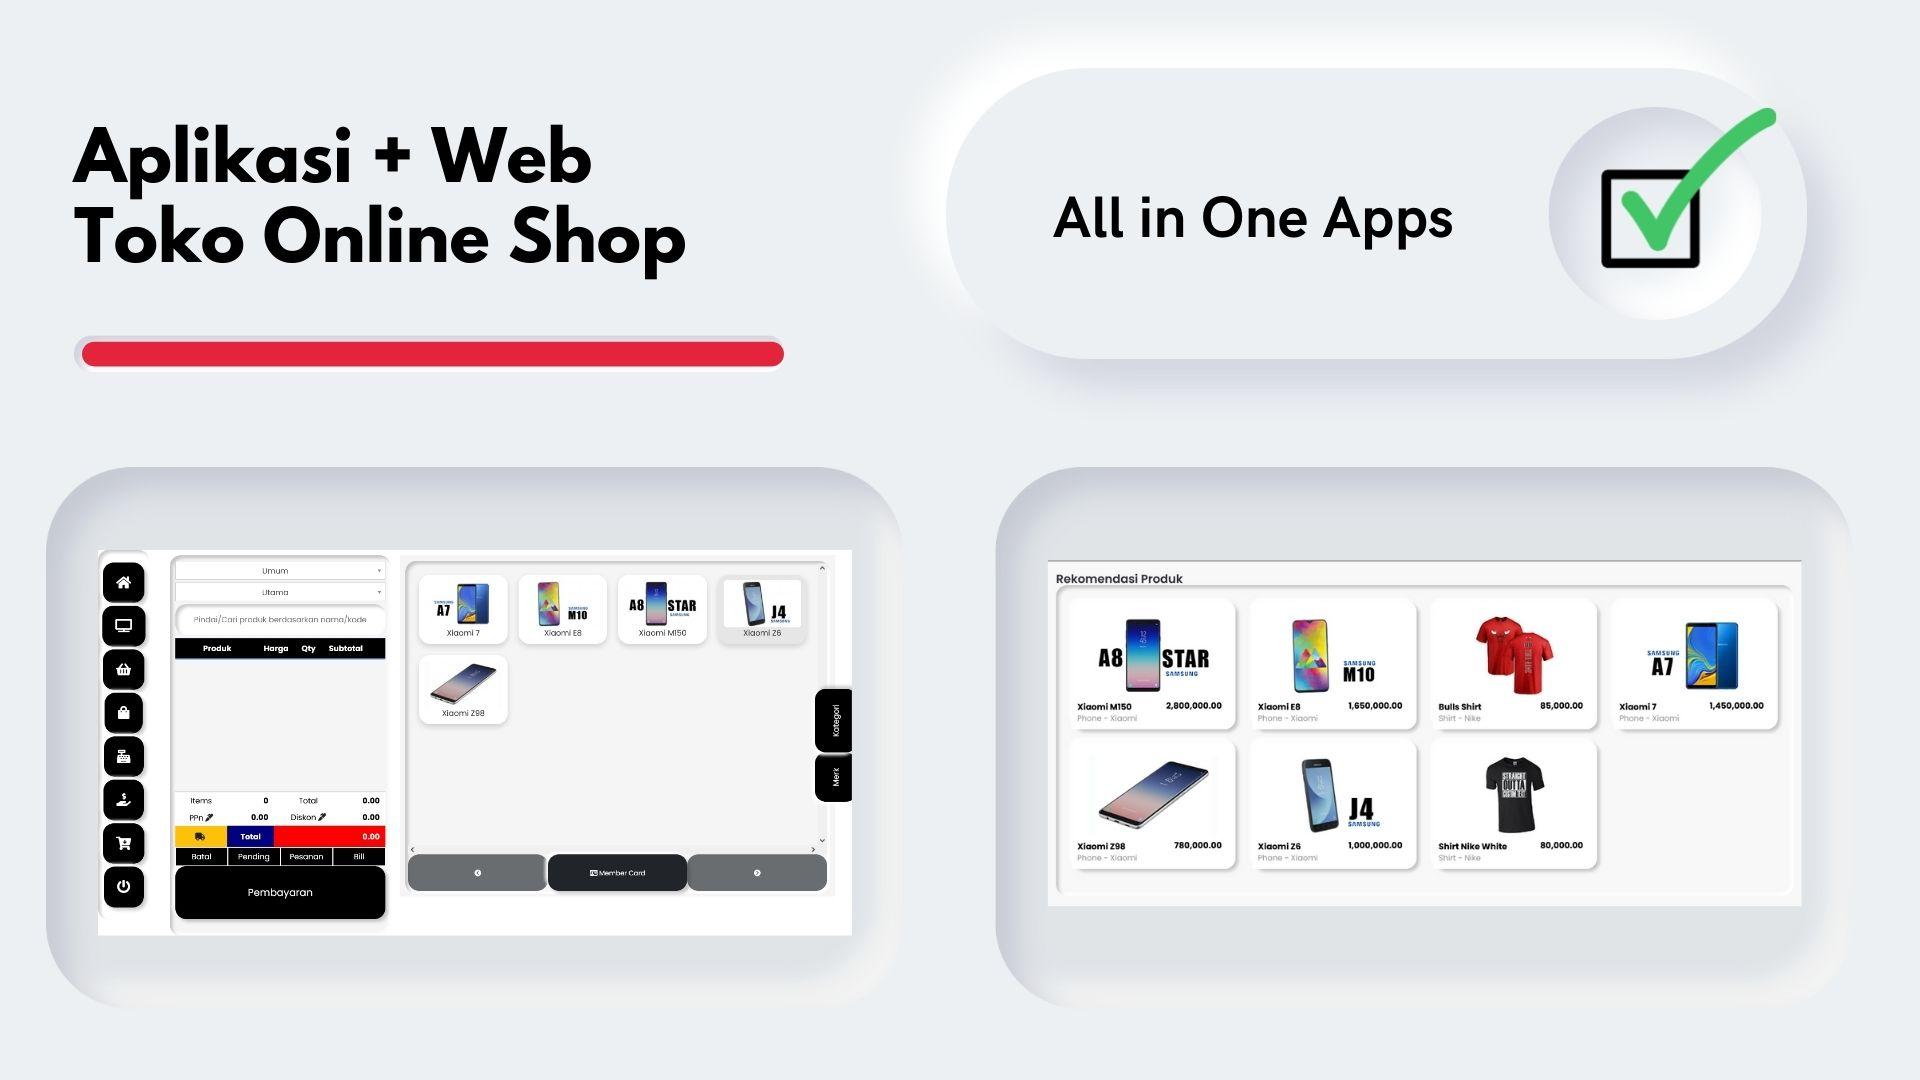 Pembuatan website toko online shop aplikasi kasir